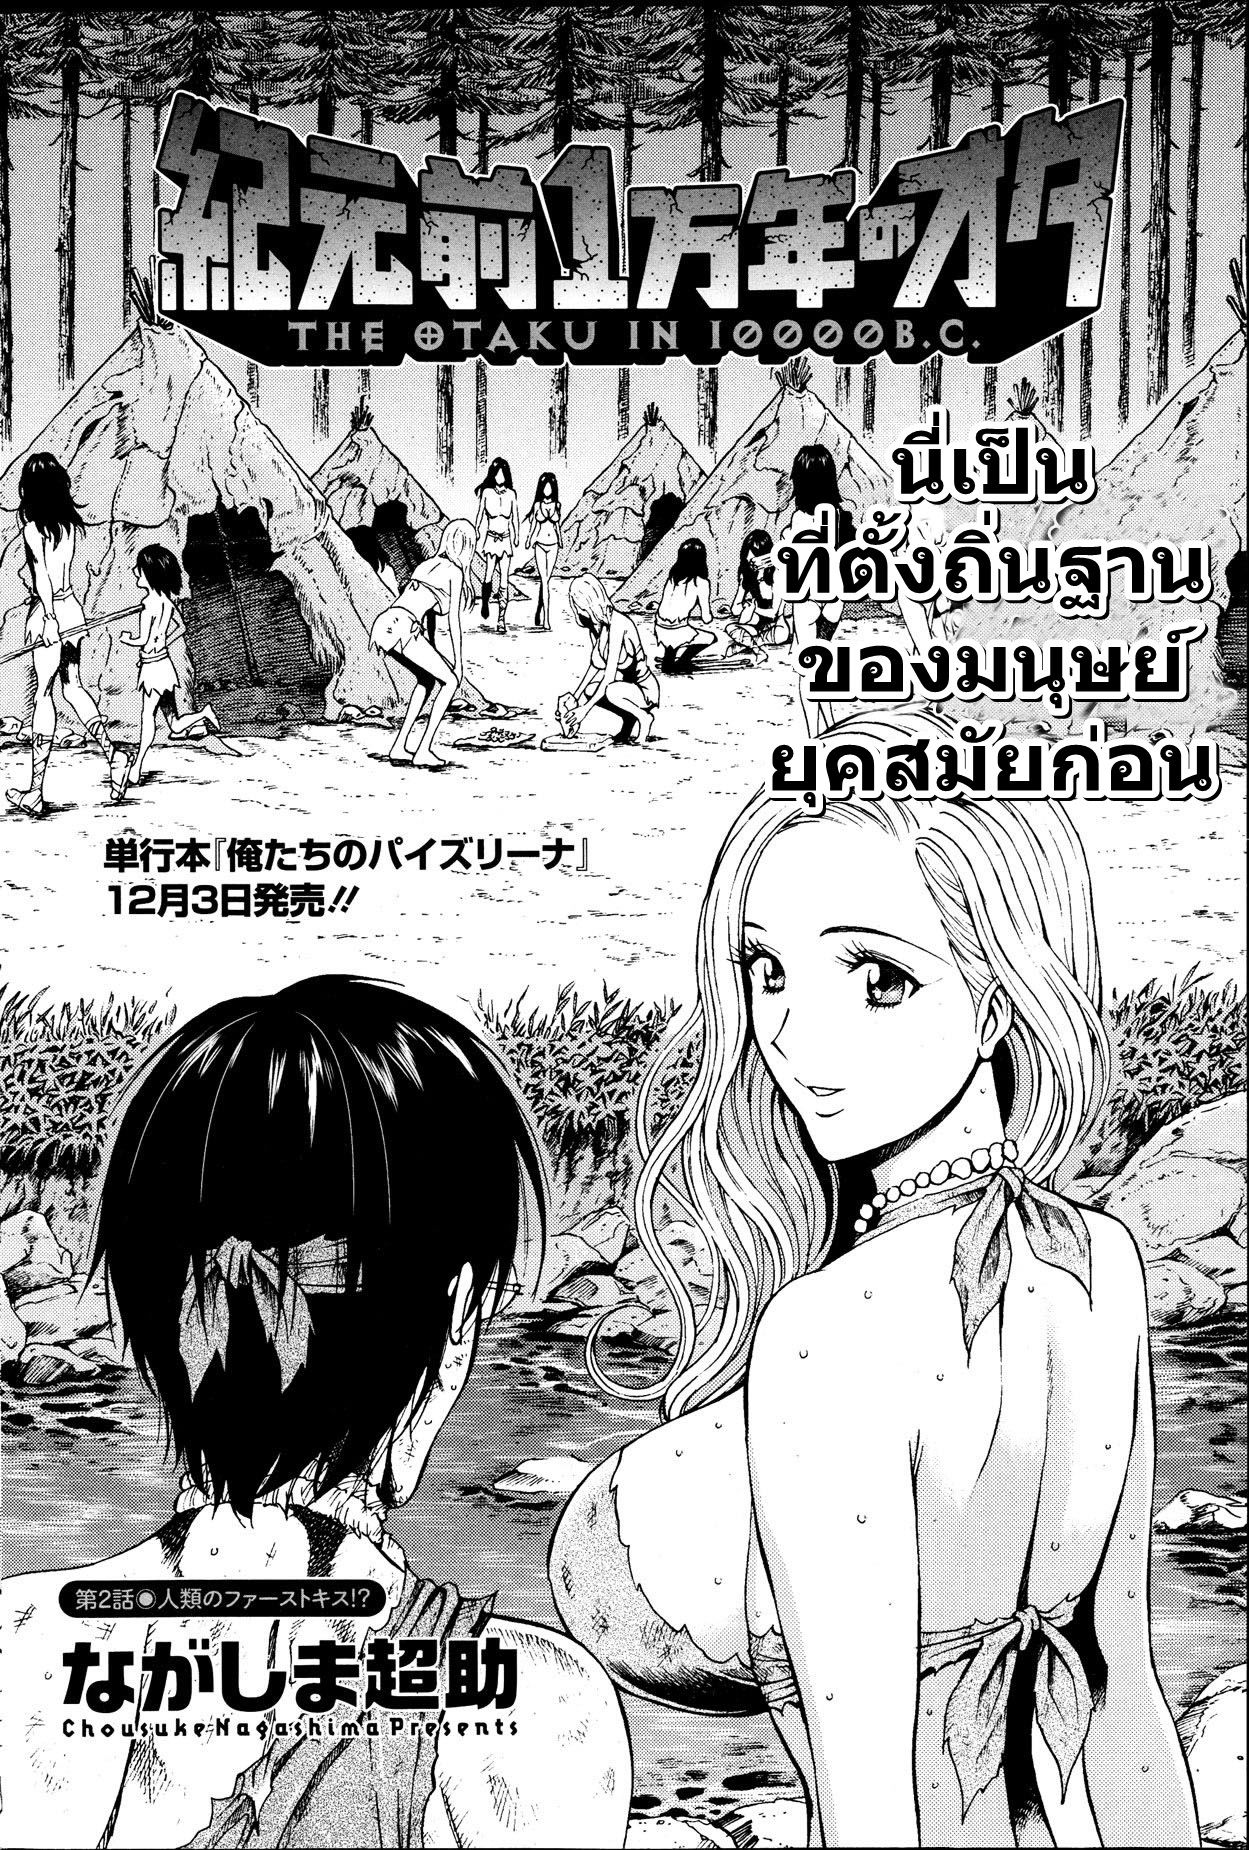 [Nagashima Chousuke] Kigenzen 10000 Nen no Ota | ไอหนุ่มโอตาคุในโลก1พันล้านปี Ch. 2 (Comic Action Pizazz DX 2013-12) [Thai ภาษาไทย]